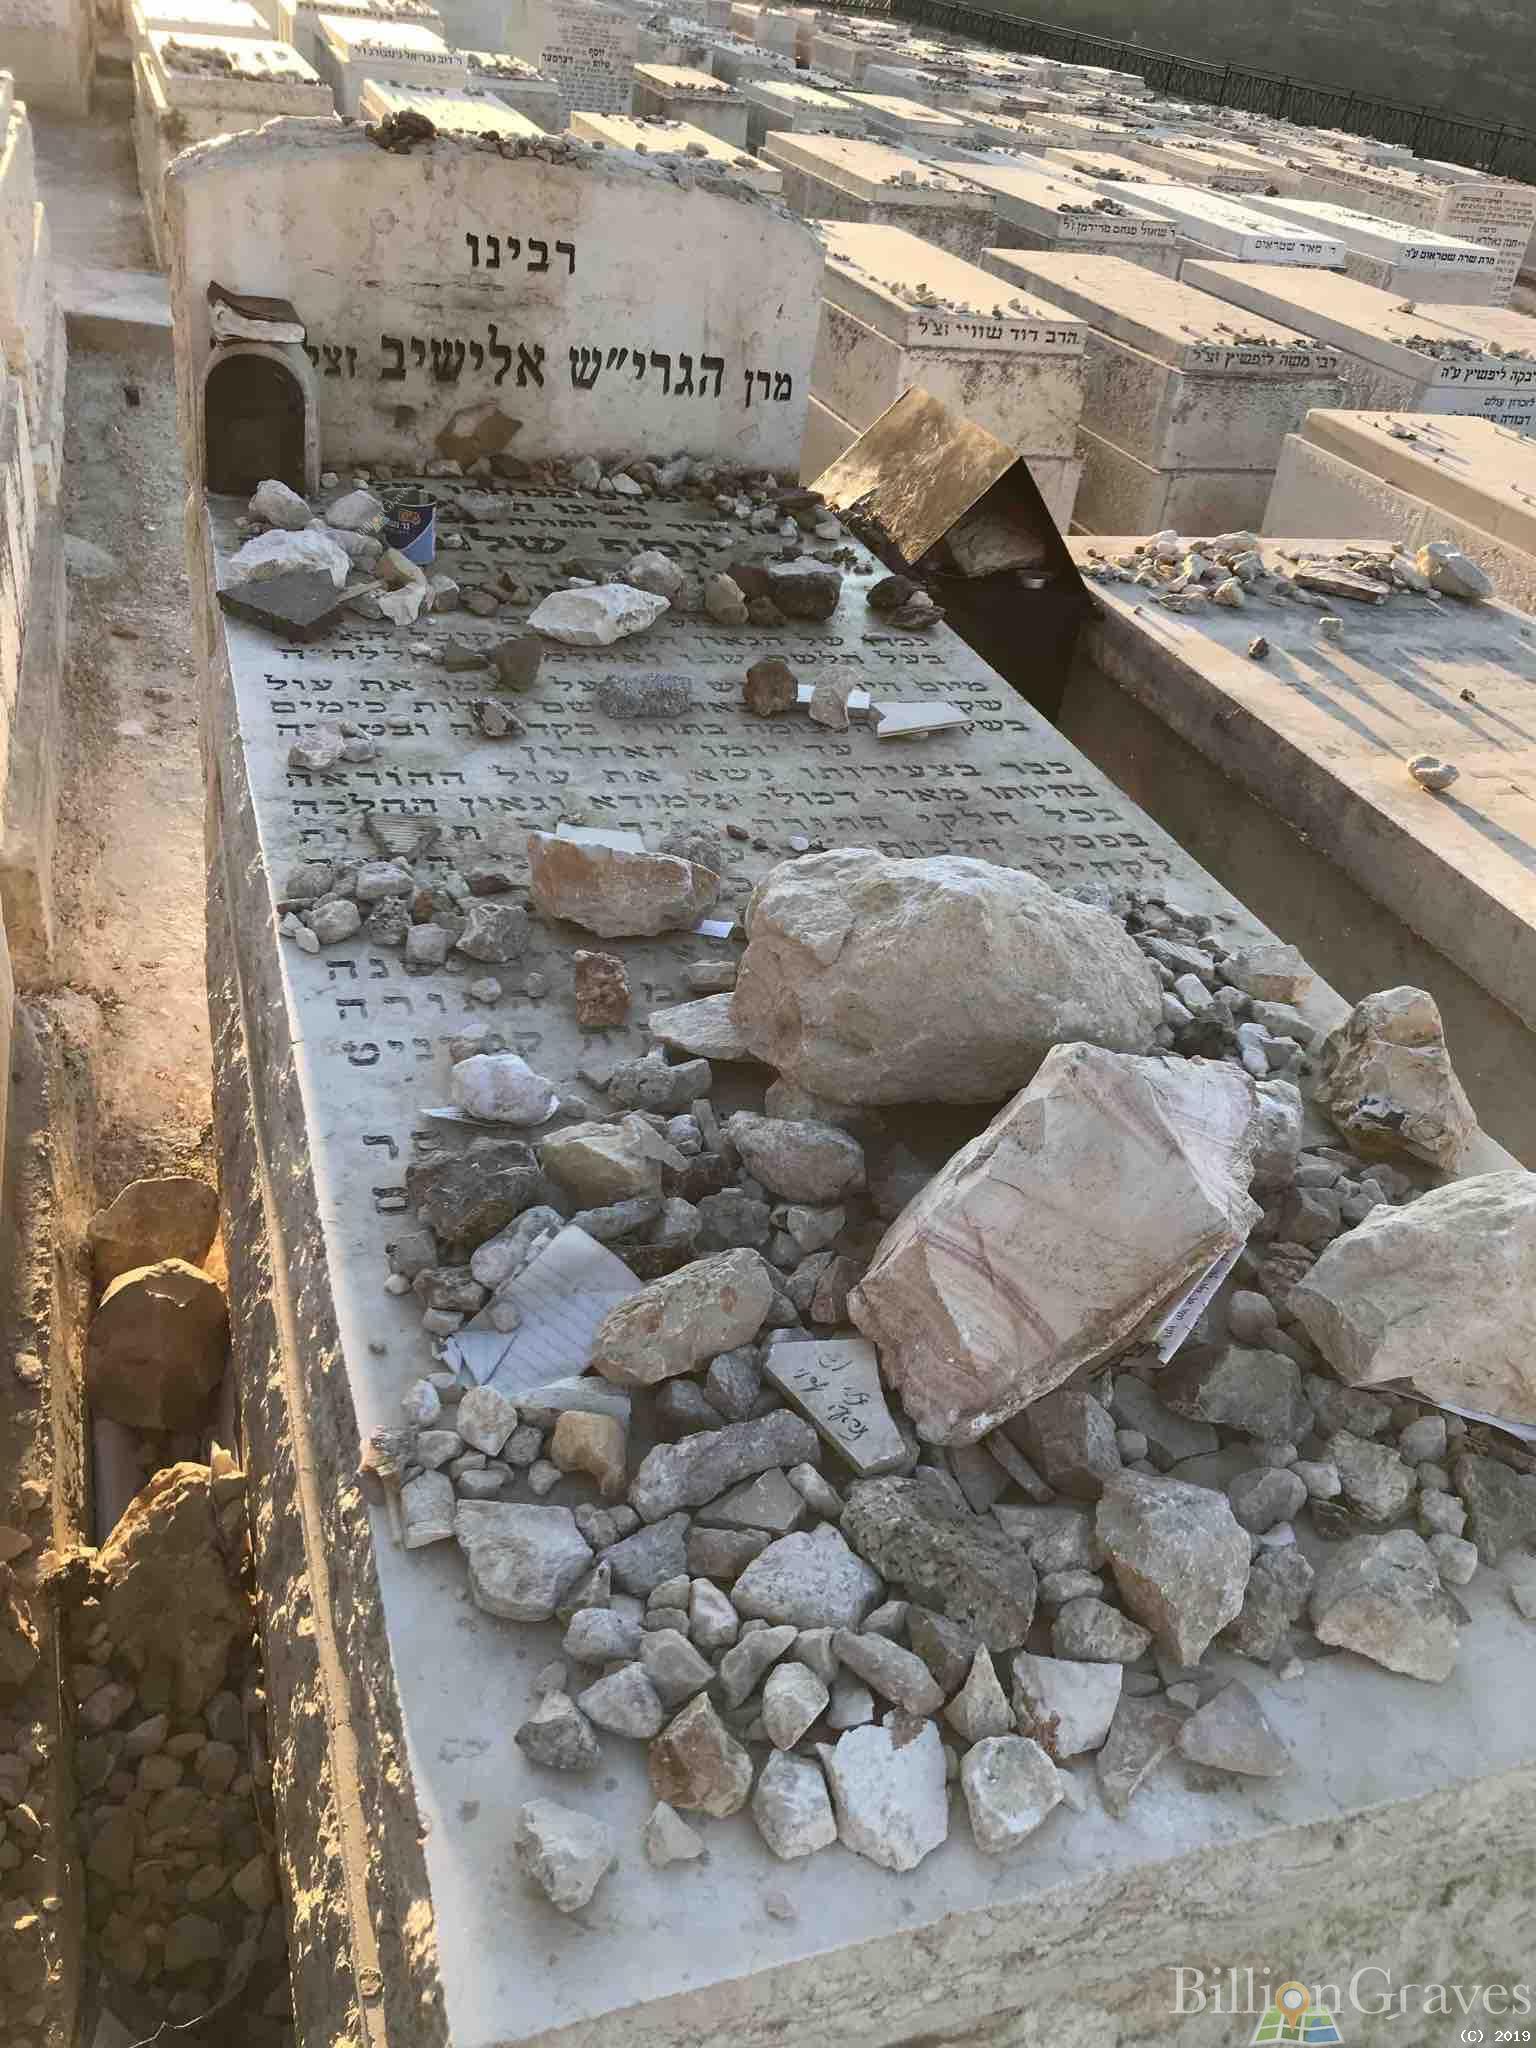 BillionGraves, Jewish, genealogy, family history, GPS, BillionGraves app, Israel, Jew, Hebrew, cemetery, grave, gravestone, rocks, Jerusalem